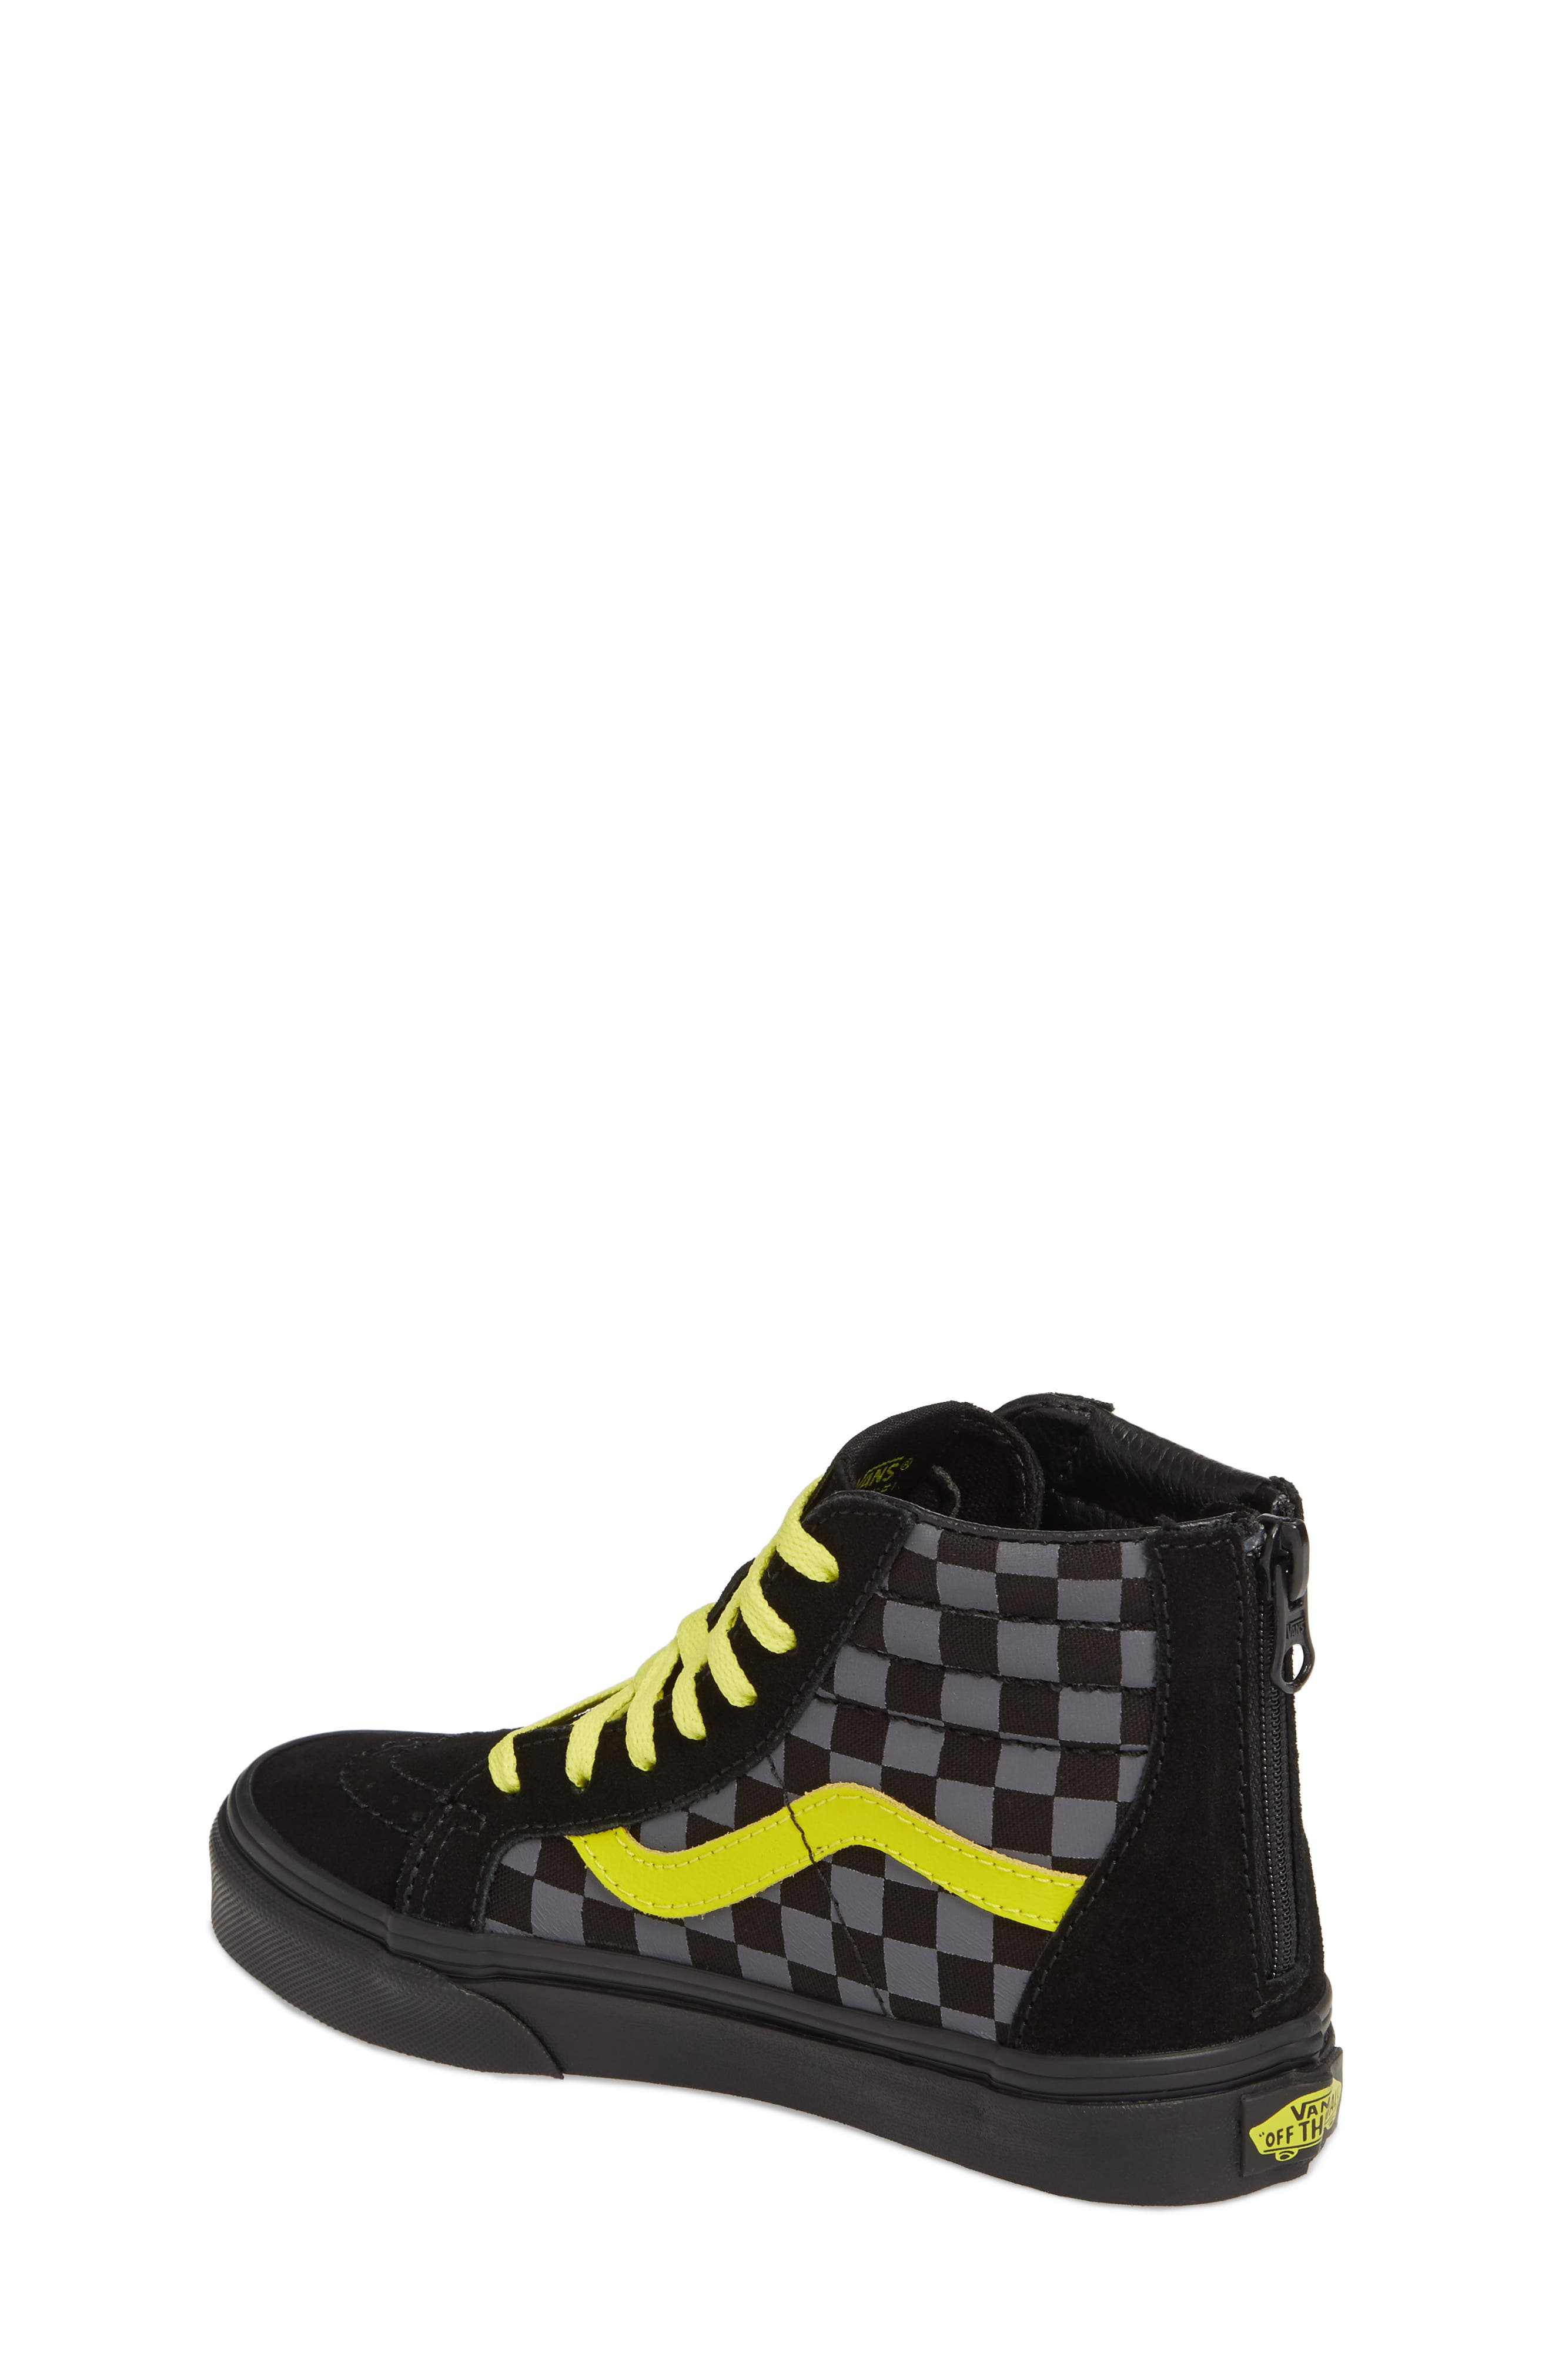 Reflective Checkerboard SK8-Hi Zip Sneaker,                             Alternate thumbnail 2, color,                             Asphalt/ Reflective